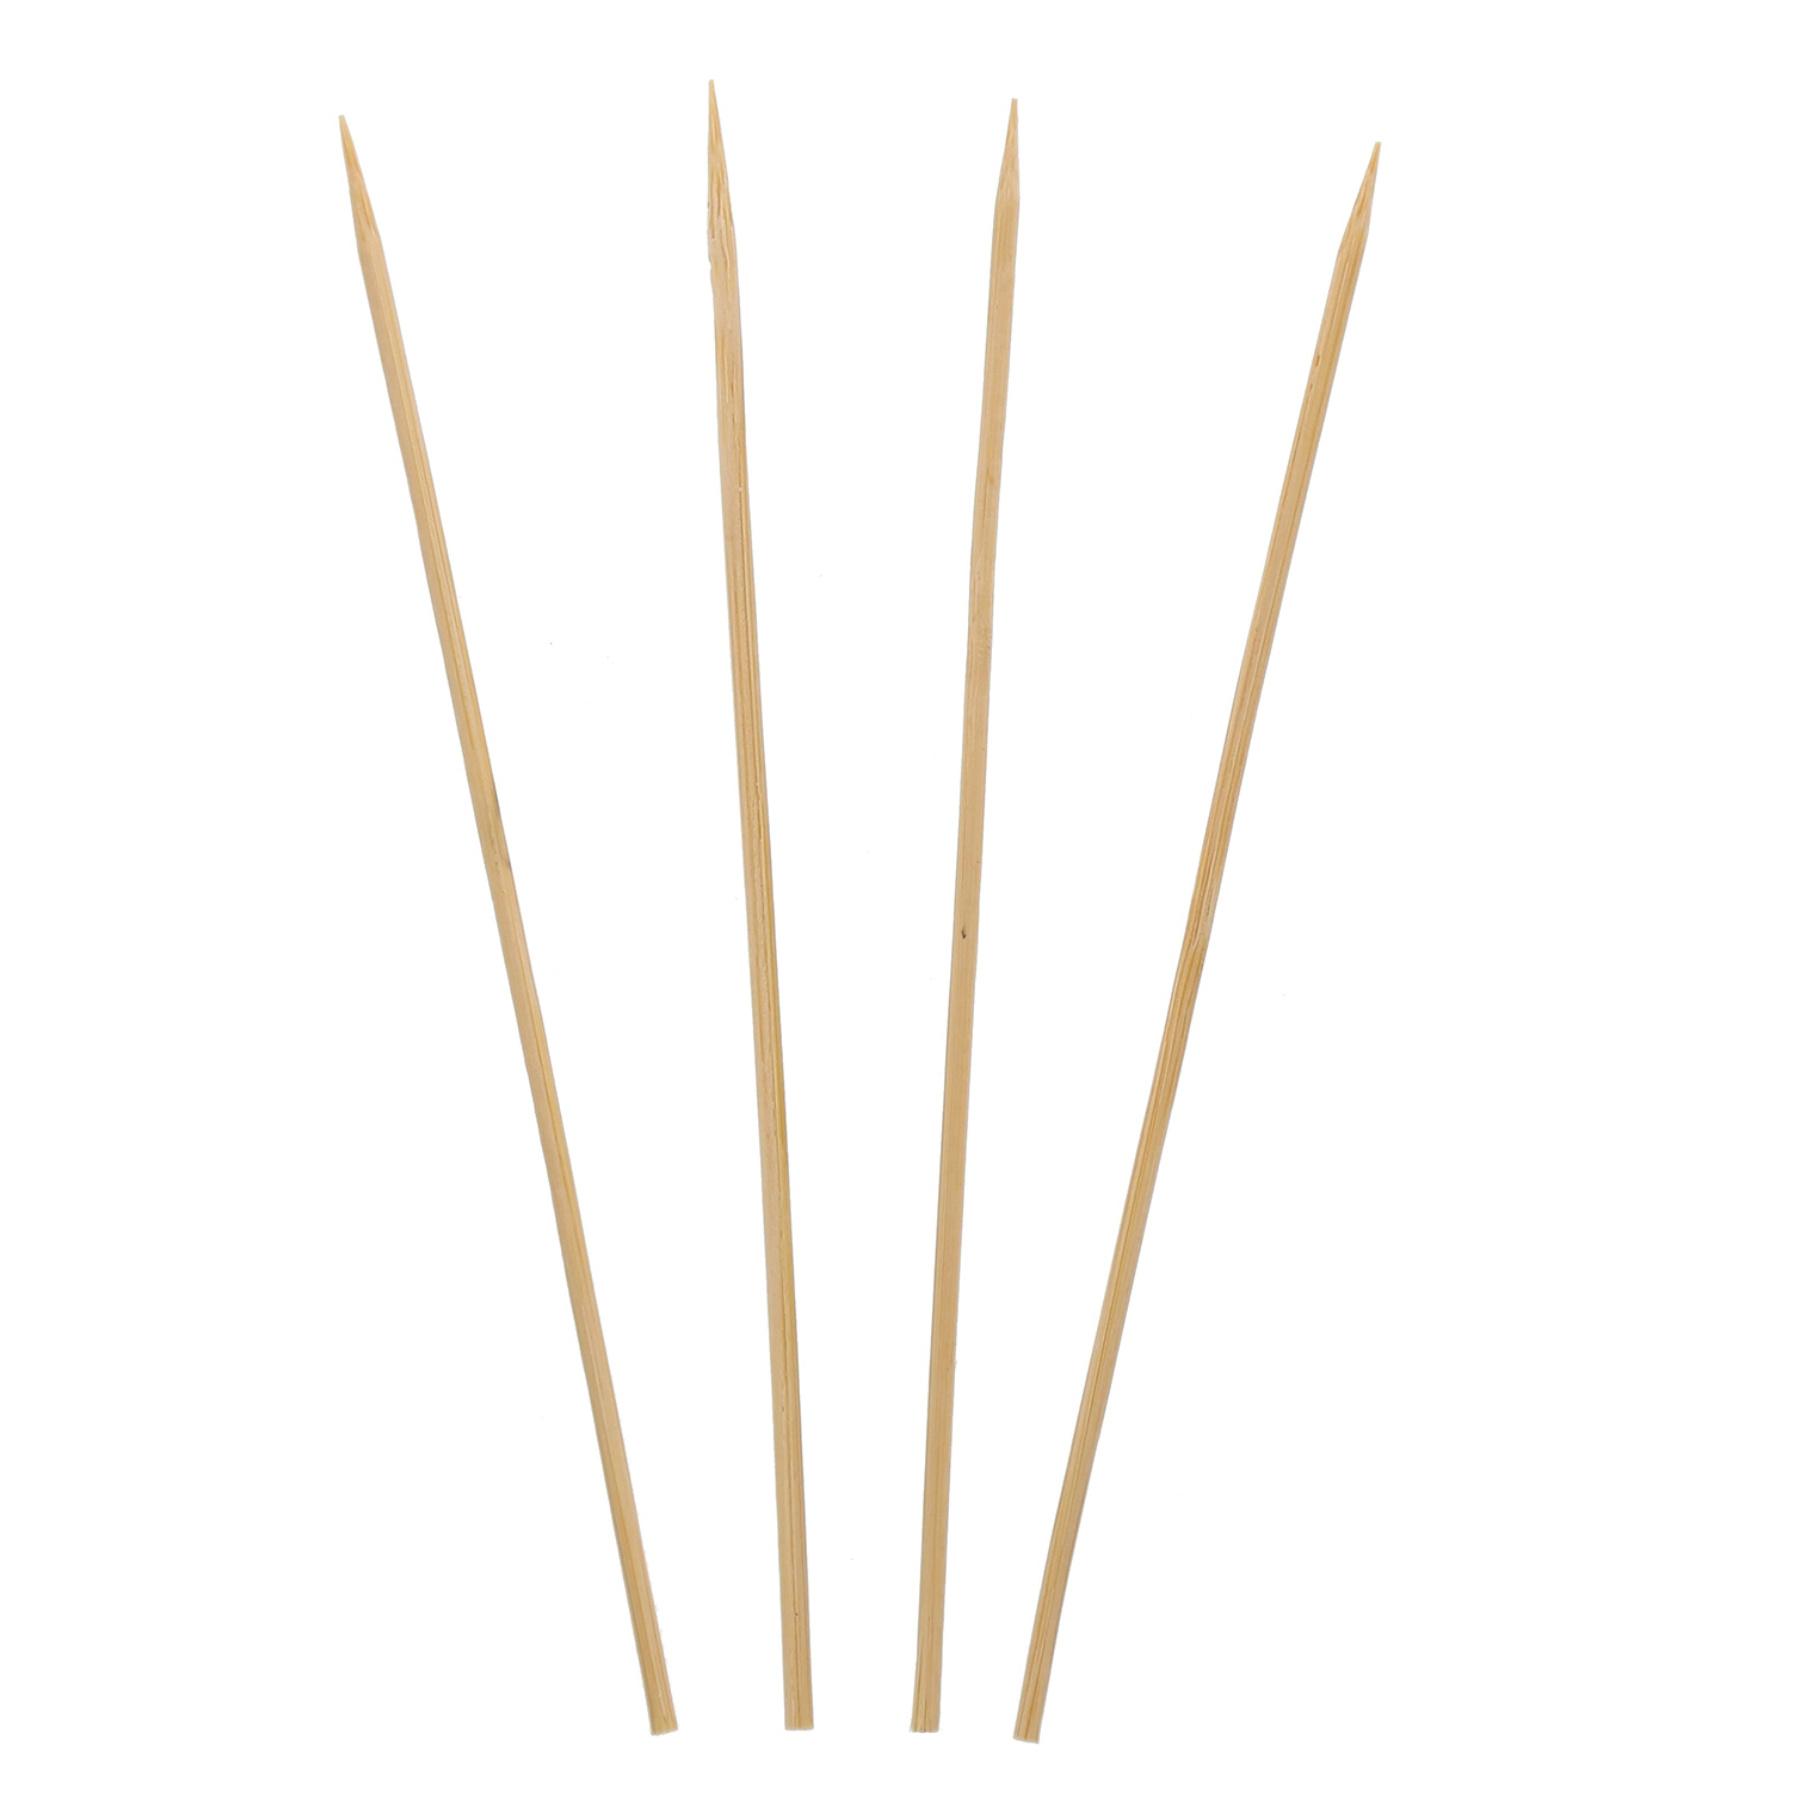 "Bamboo Skewers, 6"", Natural, 100/Pack"